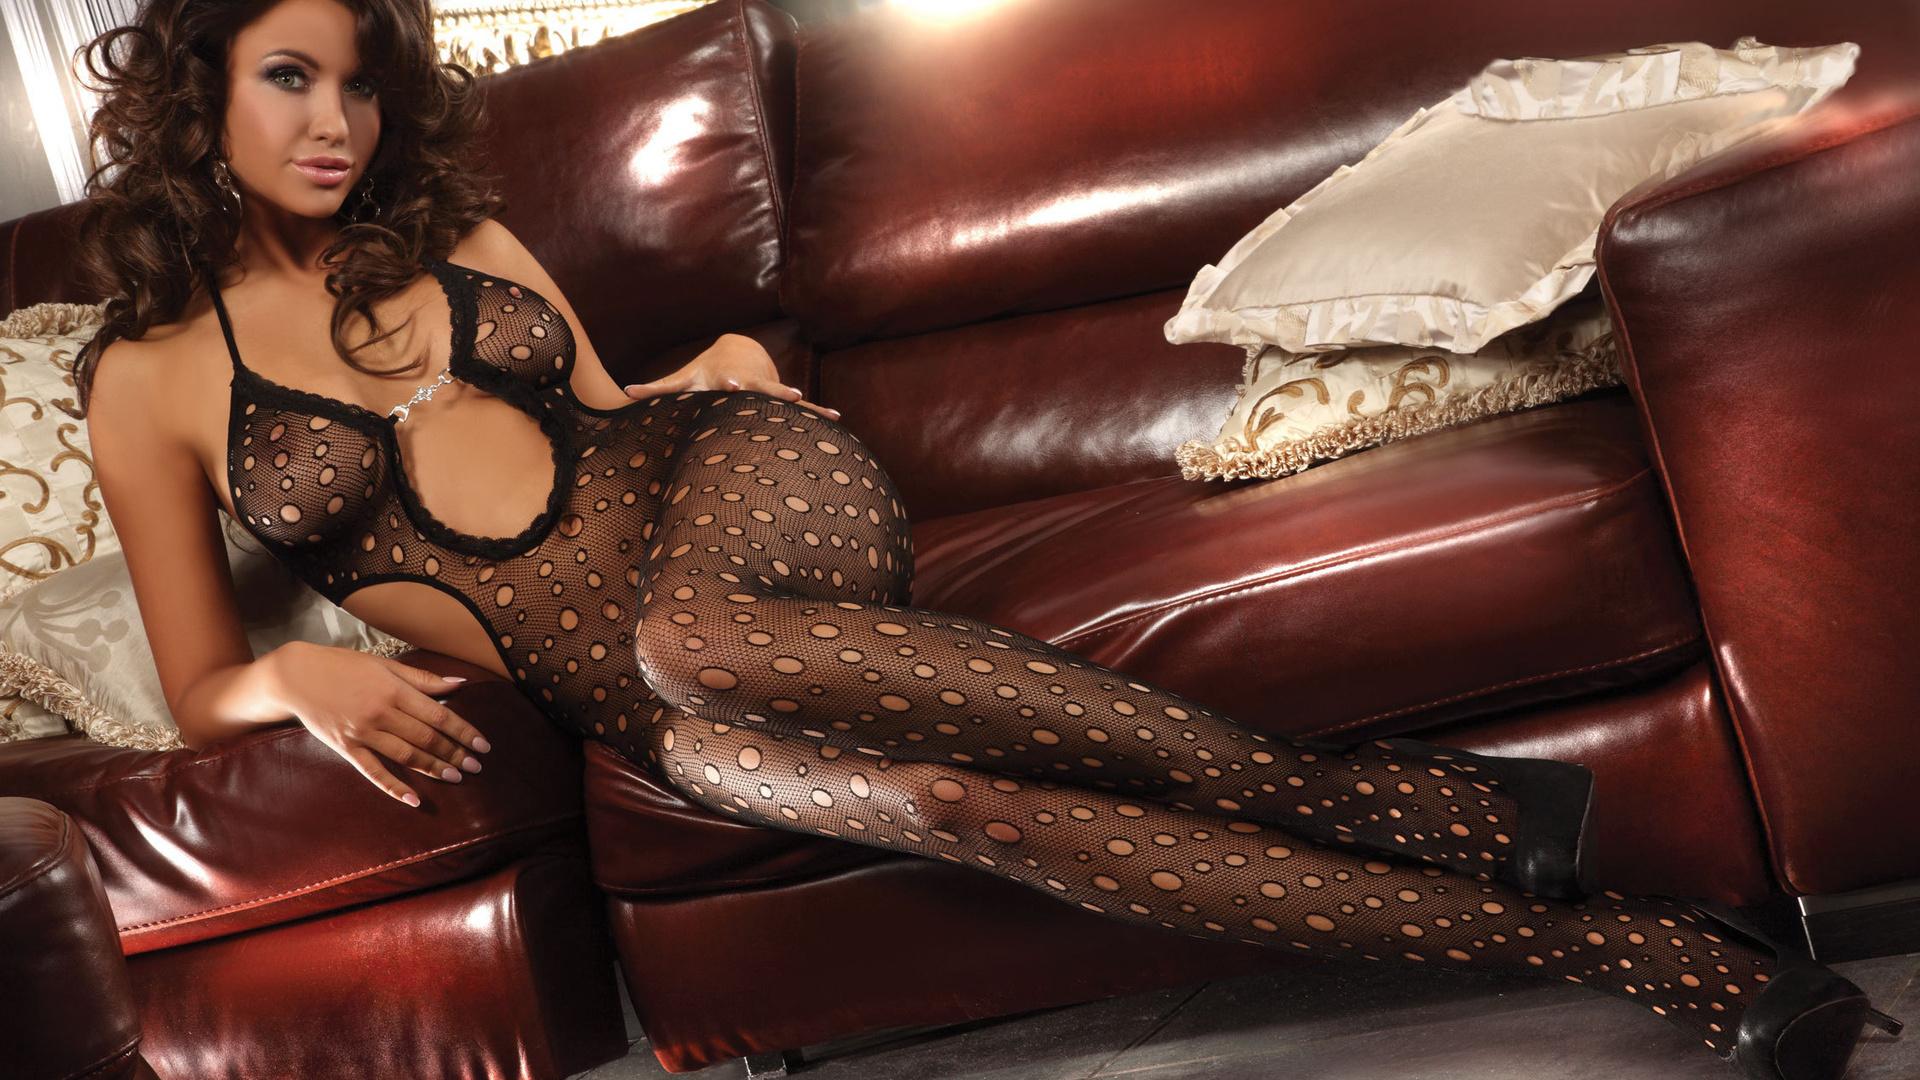 cherniy-barhat-erotich-foto